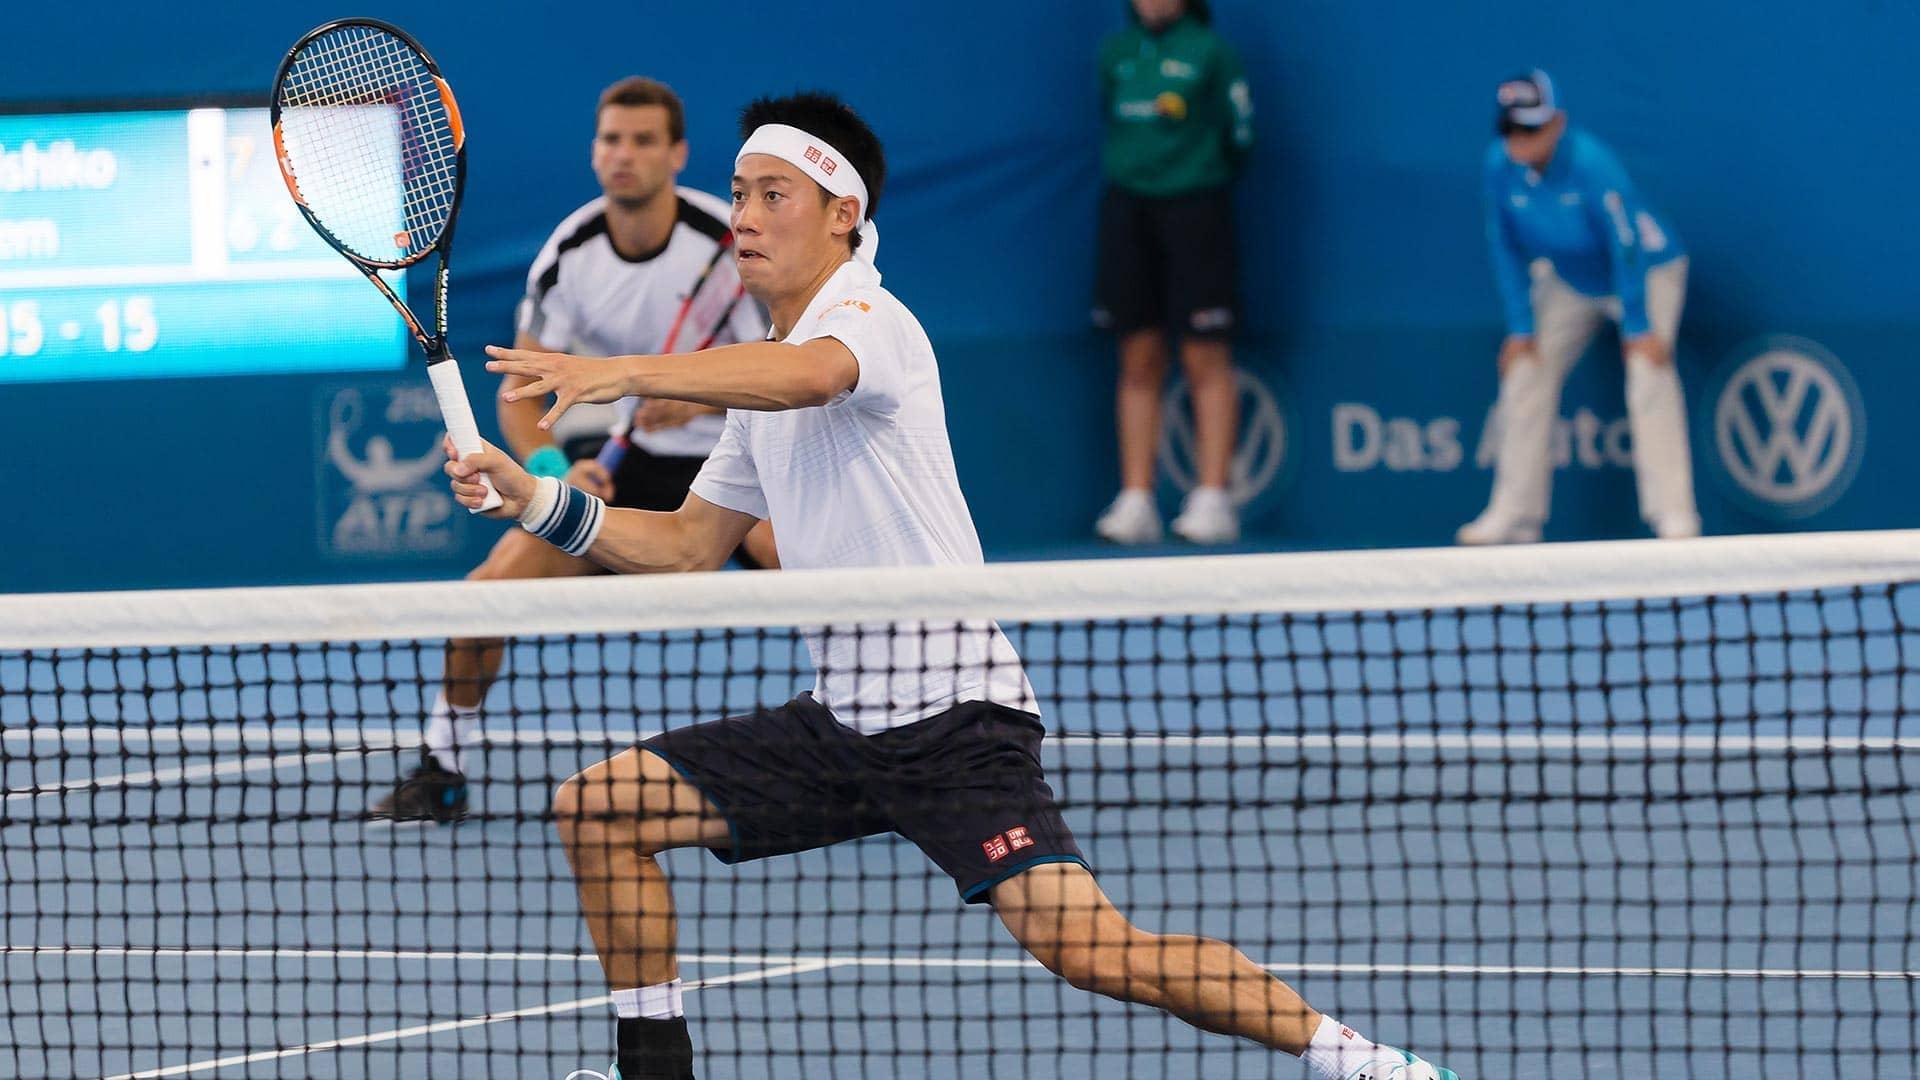 Nishikori Dimitrov Win 2016 Brisbane Doubles Opener | ATP Tour ...